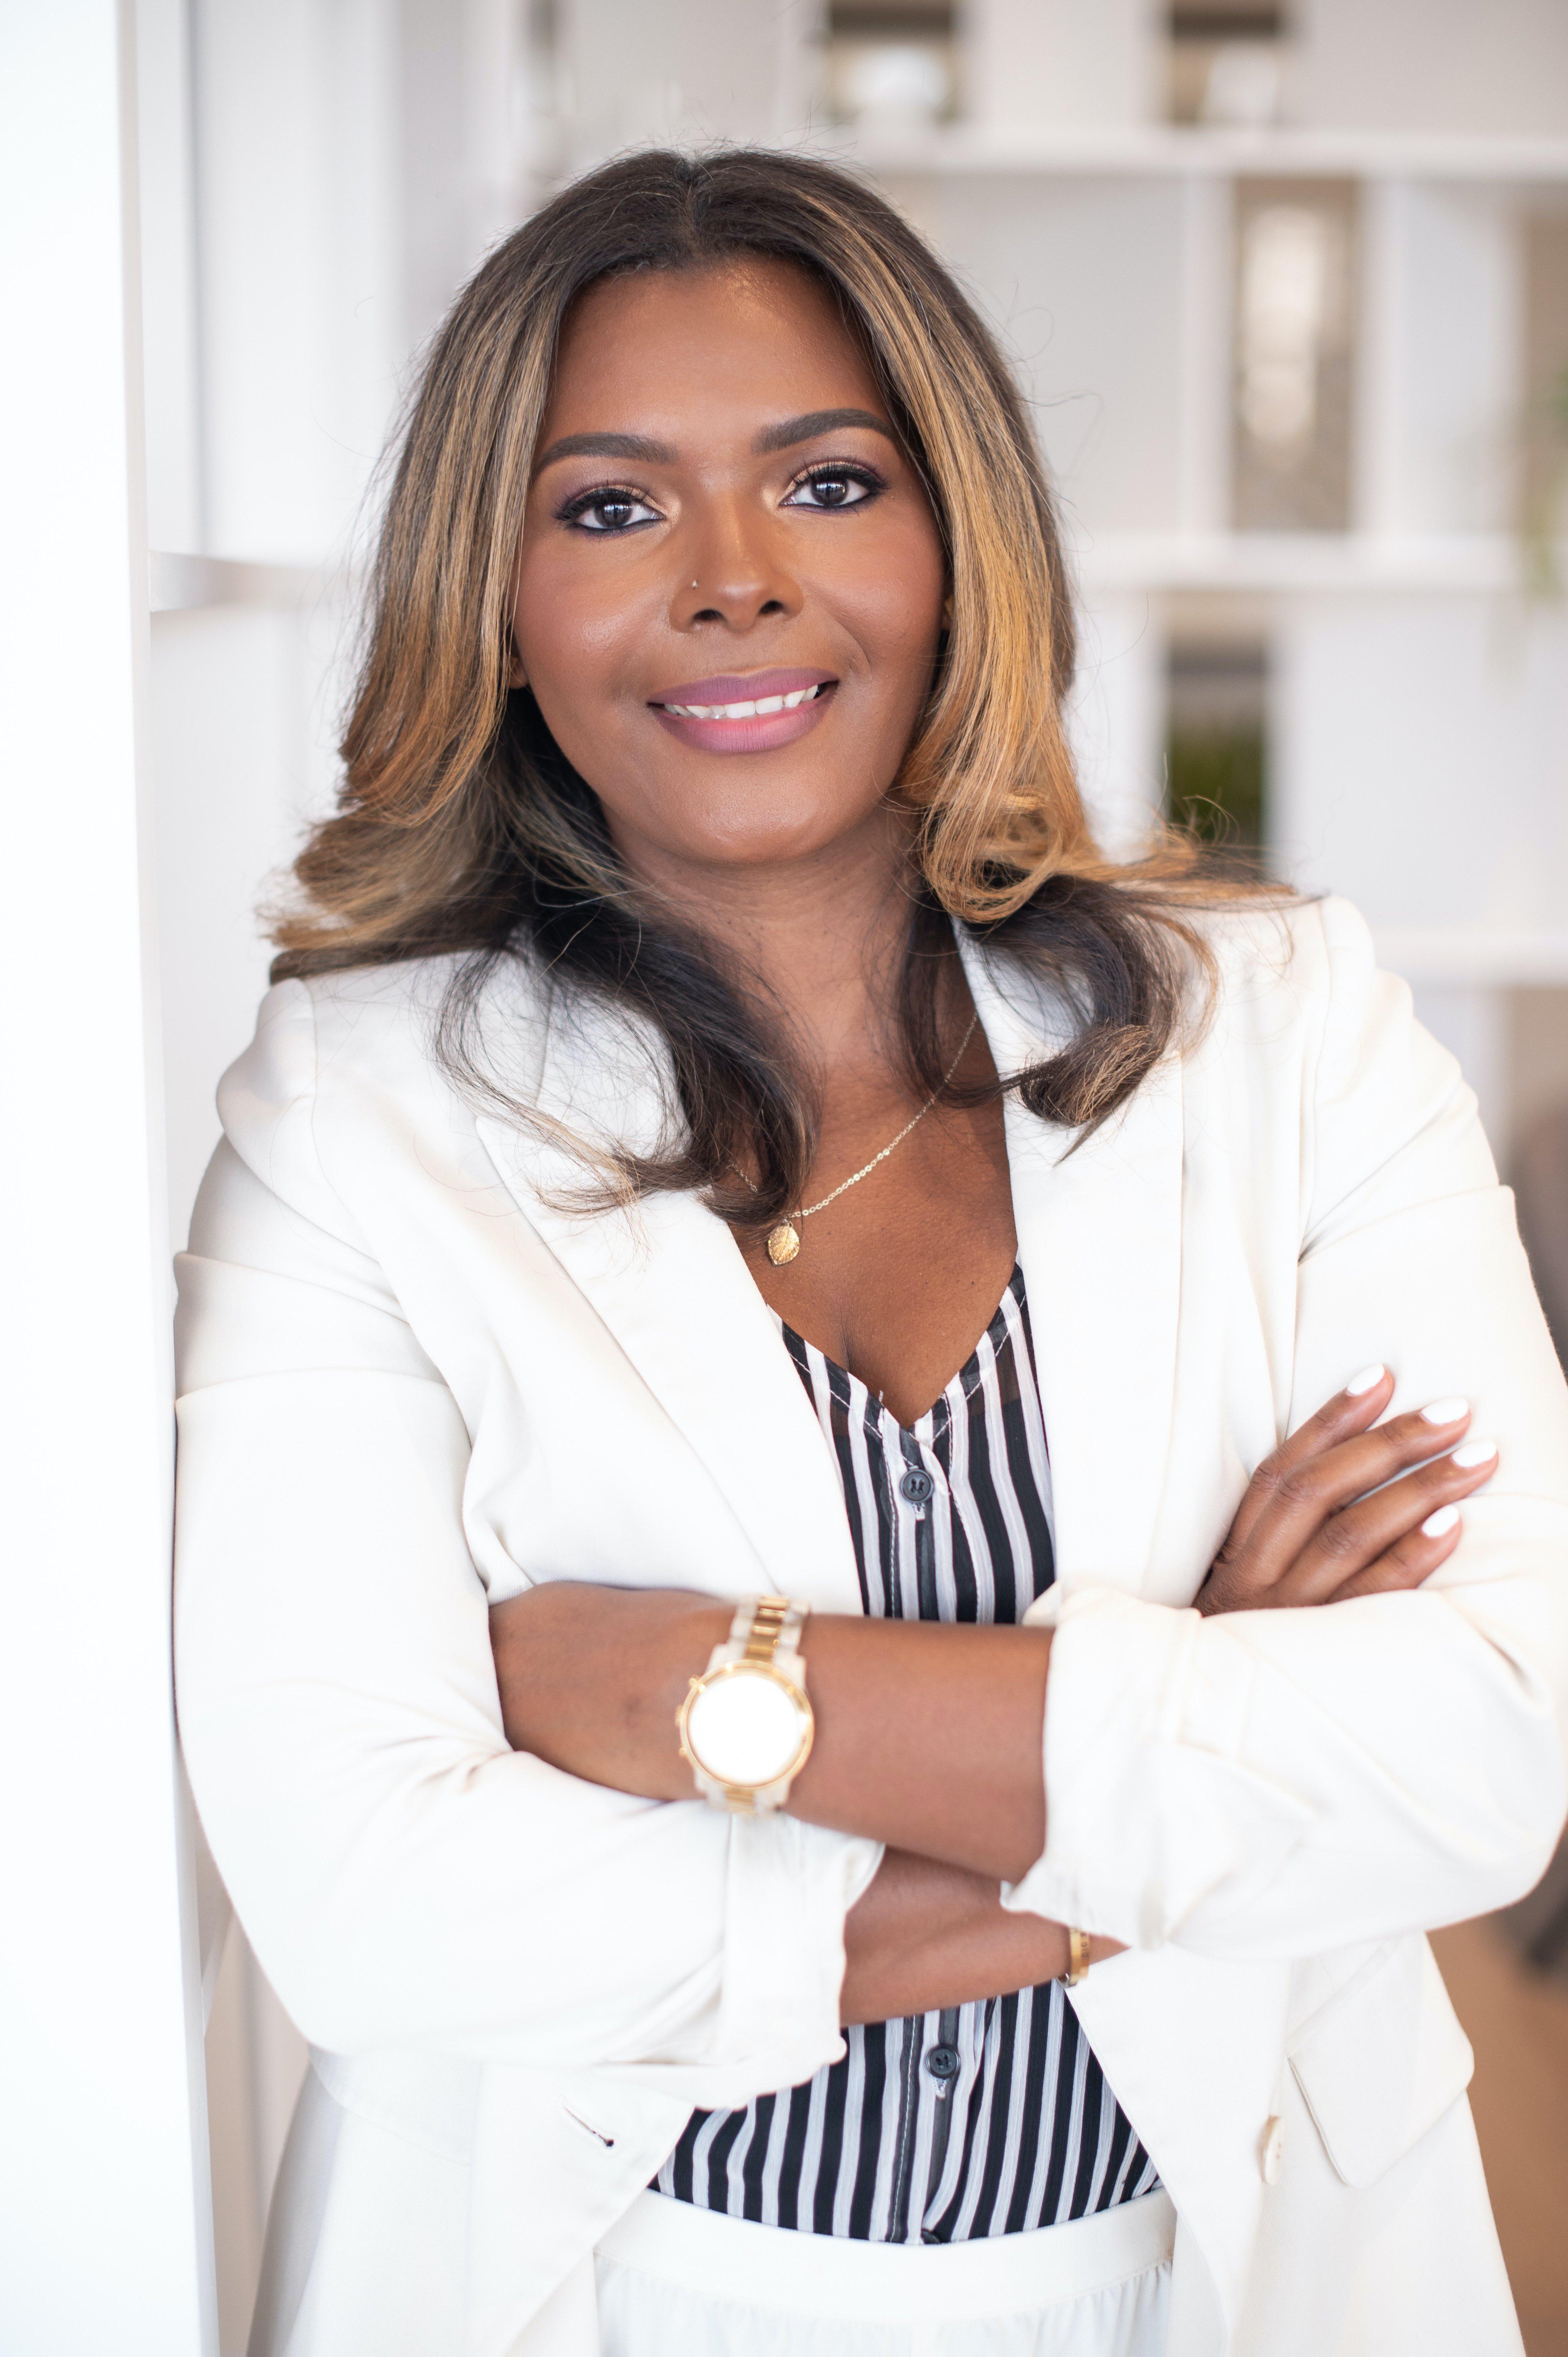 Dr. Jessica Jackson